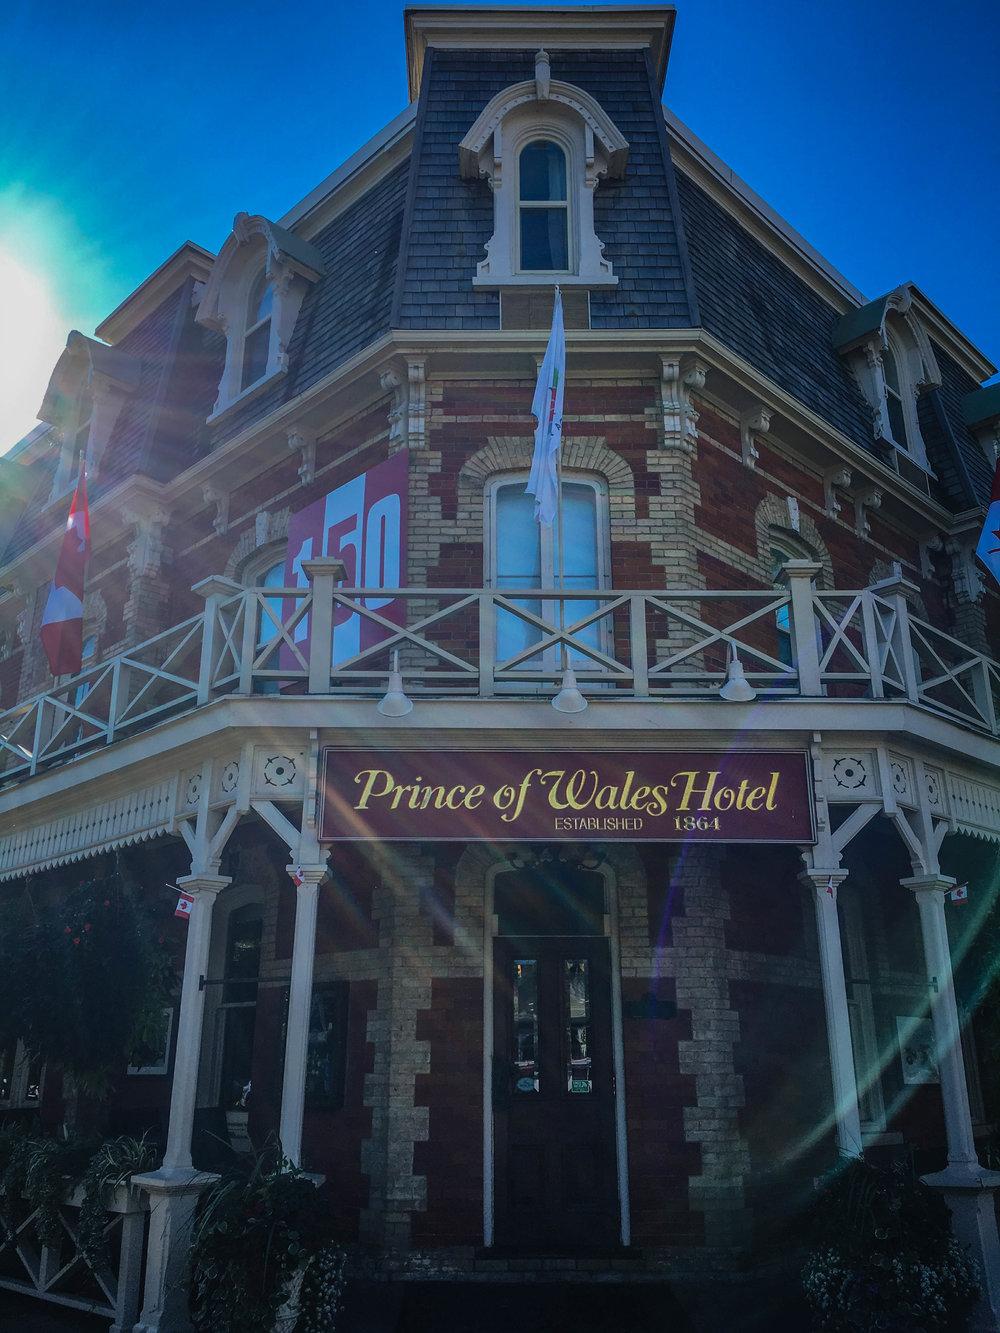 Niagara-on-the-Lake, Prince of Wales hotel